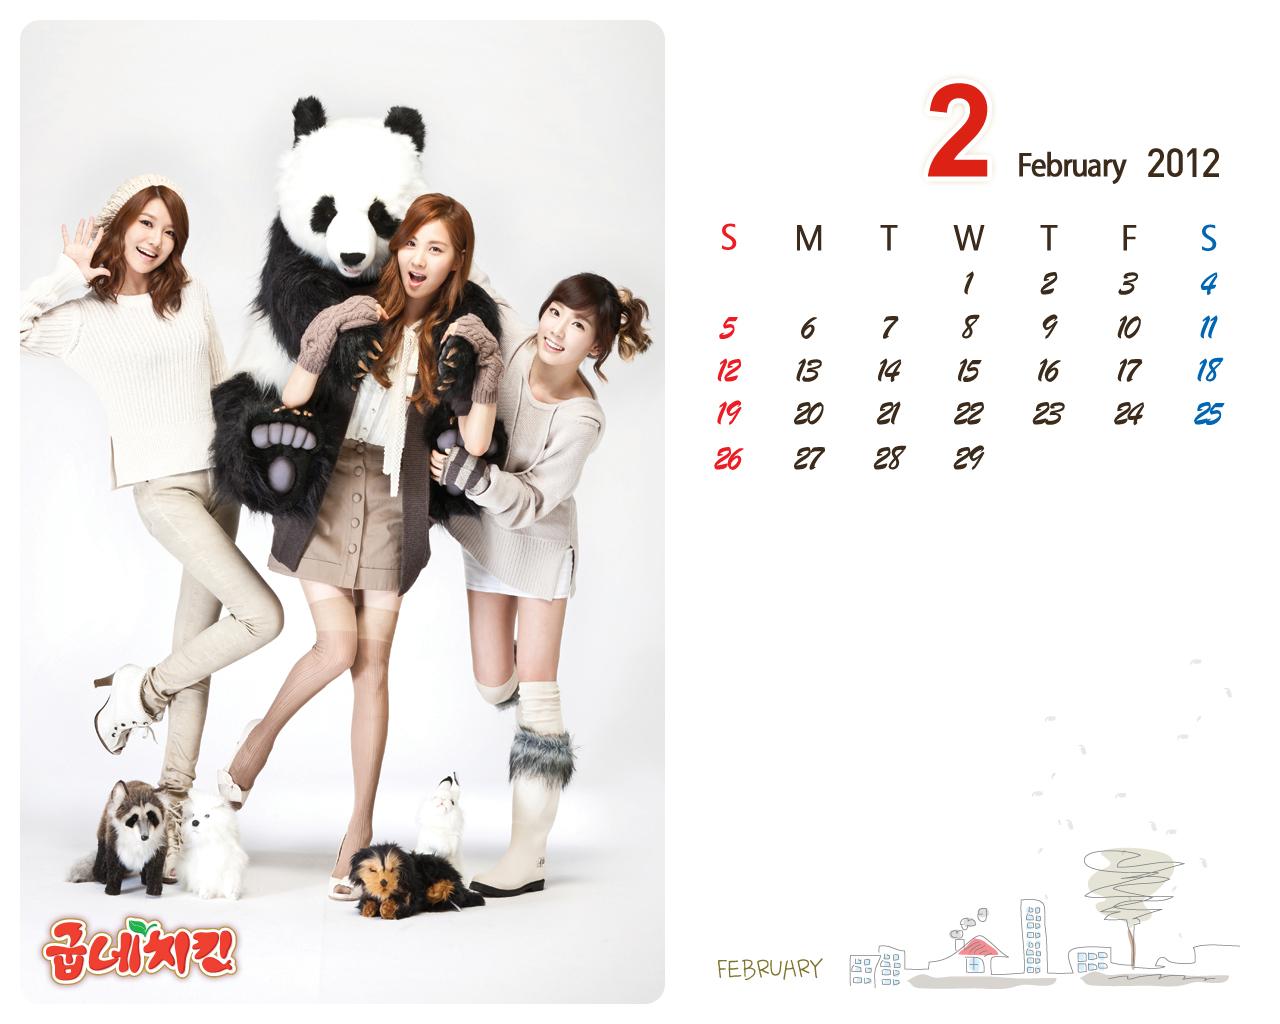 Girls' Generation Sooyoung Seohyun & Taeyeon Goobne February 2012 calendar